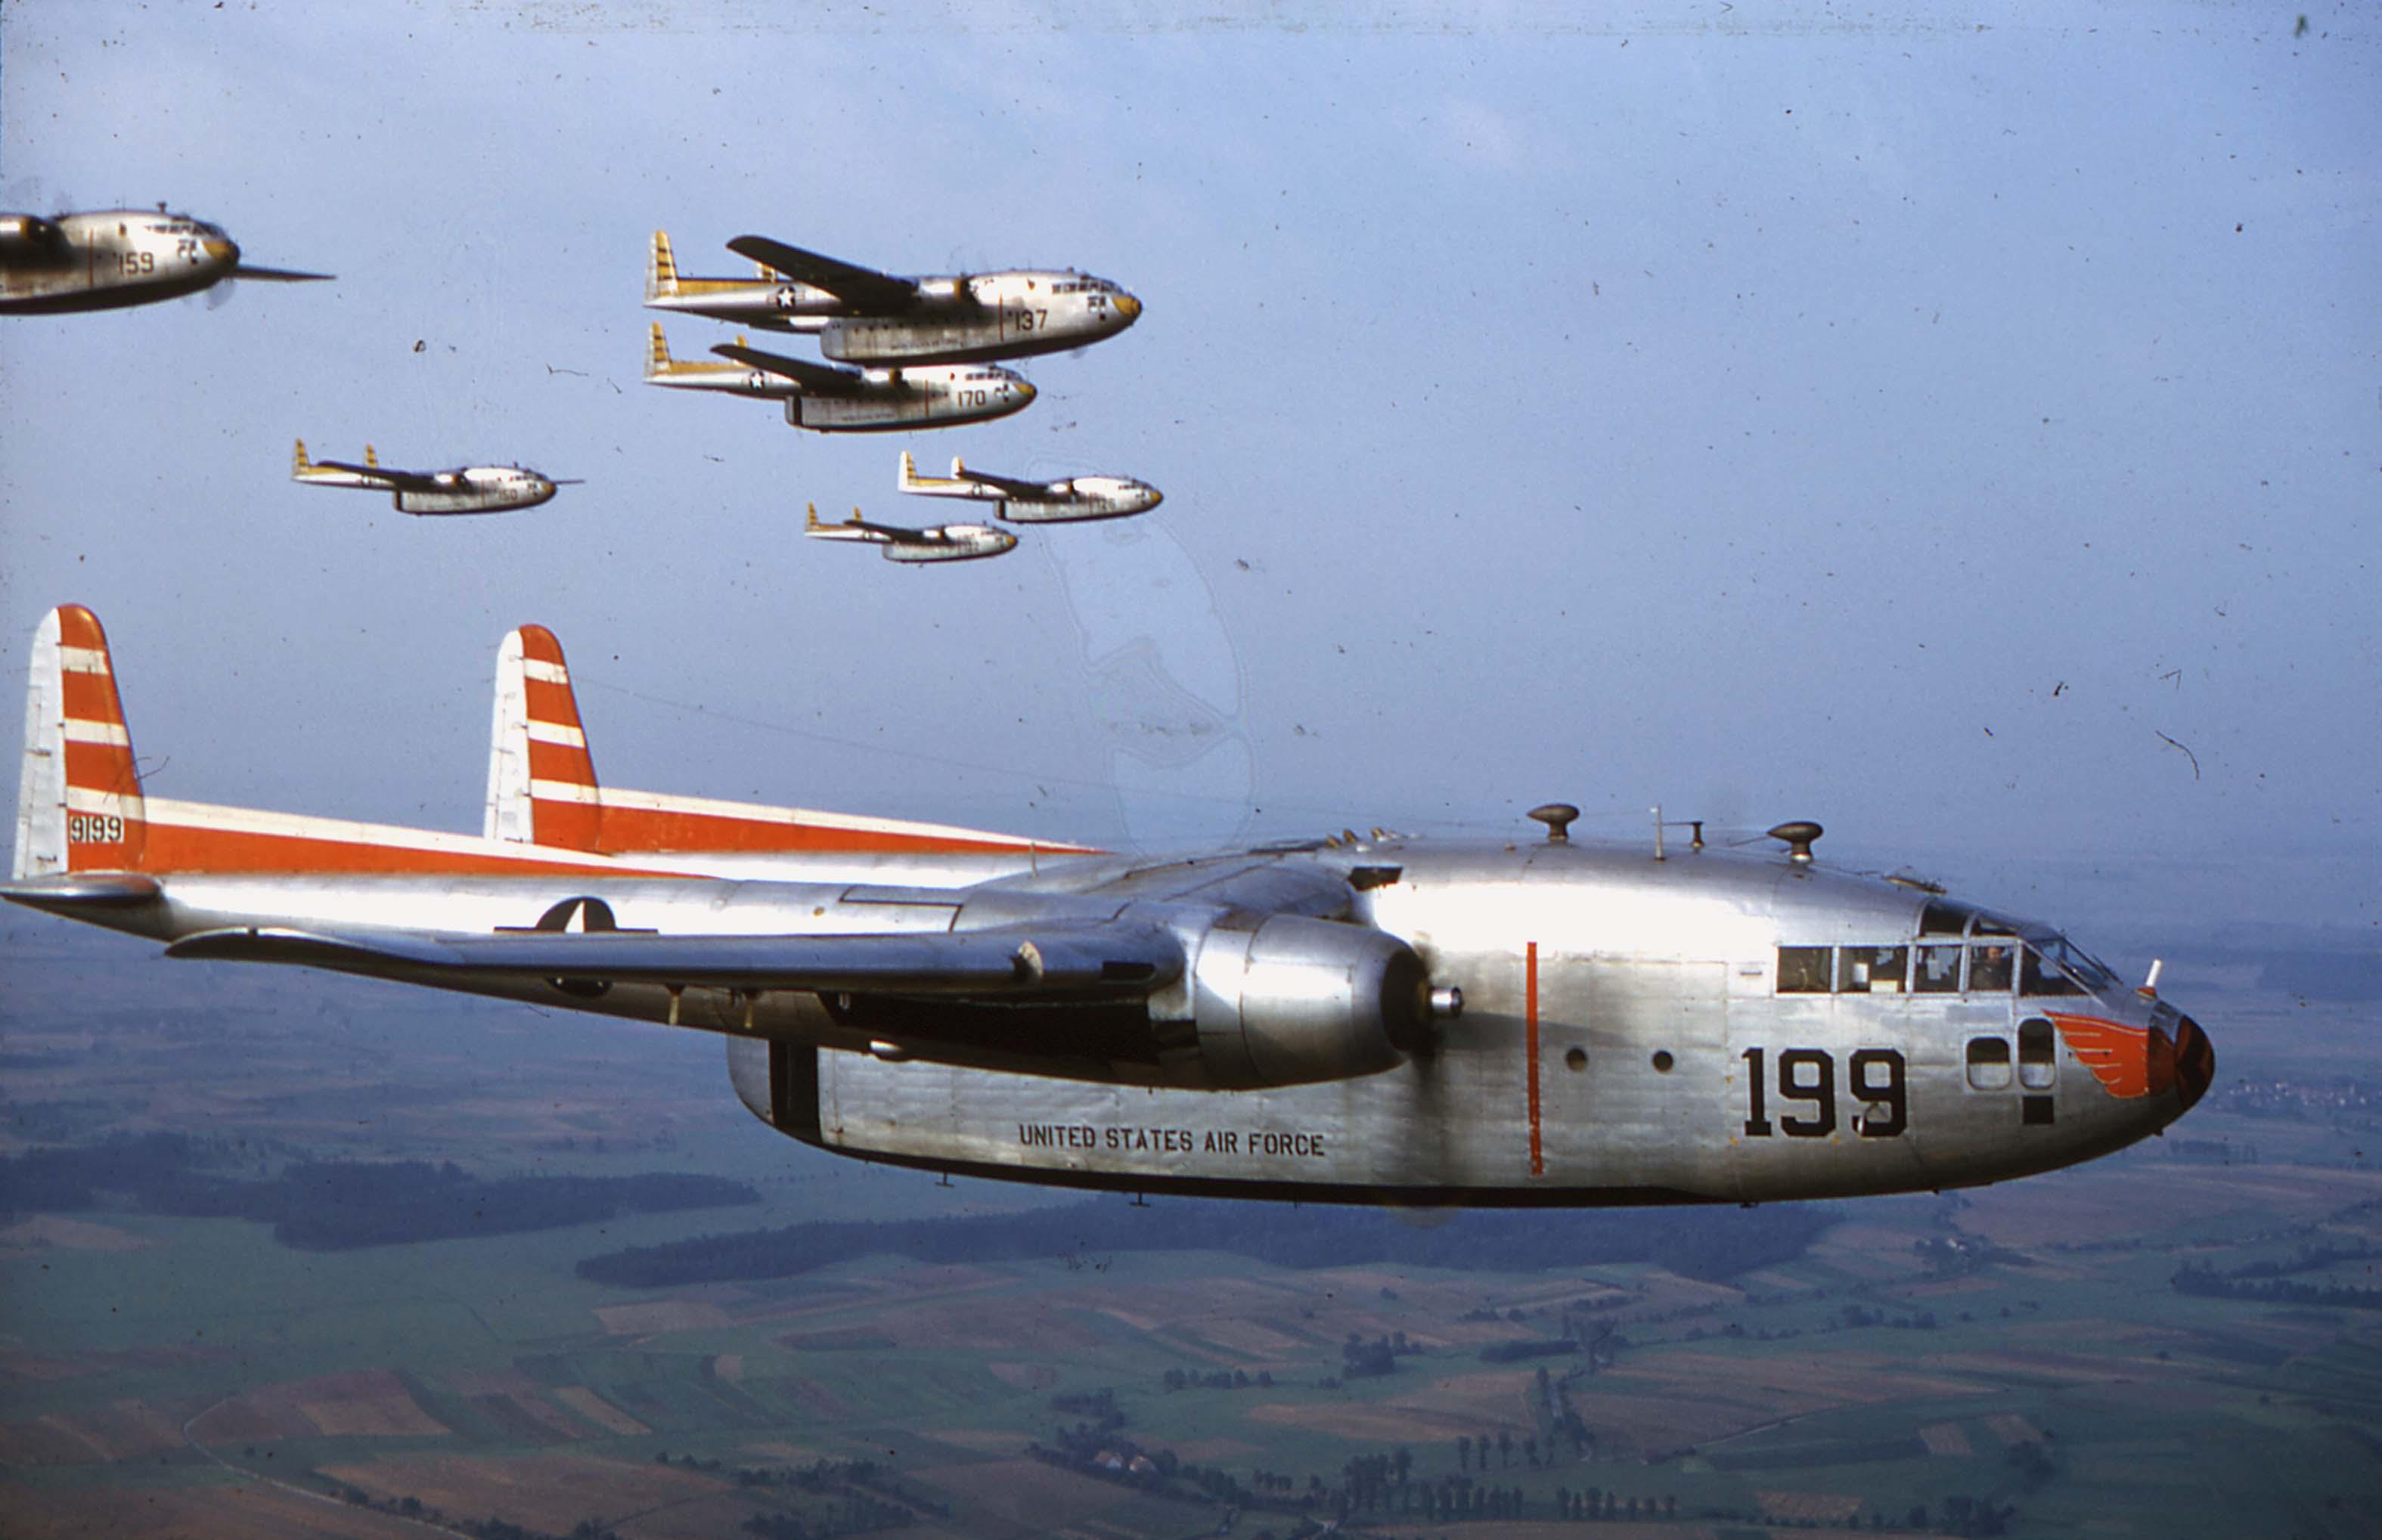 /u/mycroftxxx42 father shoots Air Force plane with arrow ...